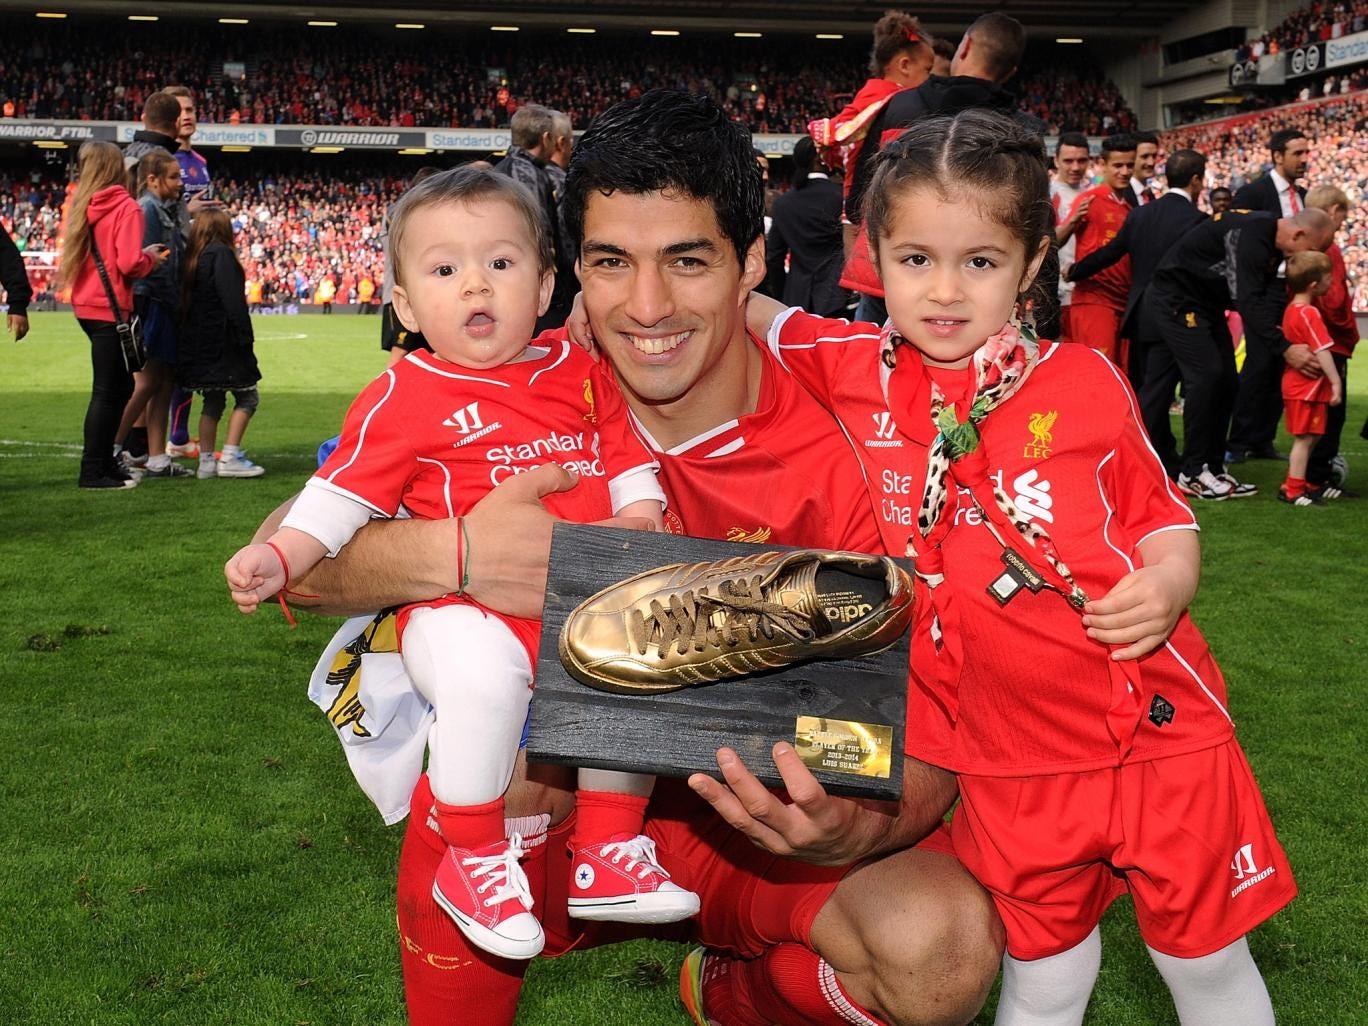 Luis Suarez won the golden boot for scoring 31 goals